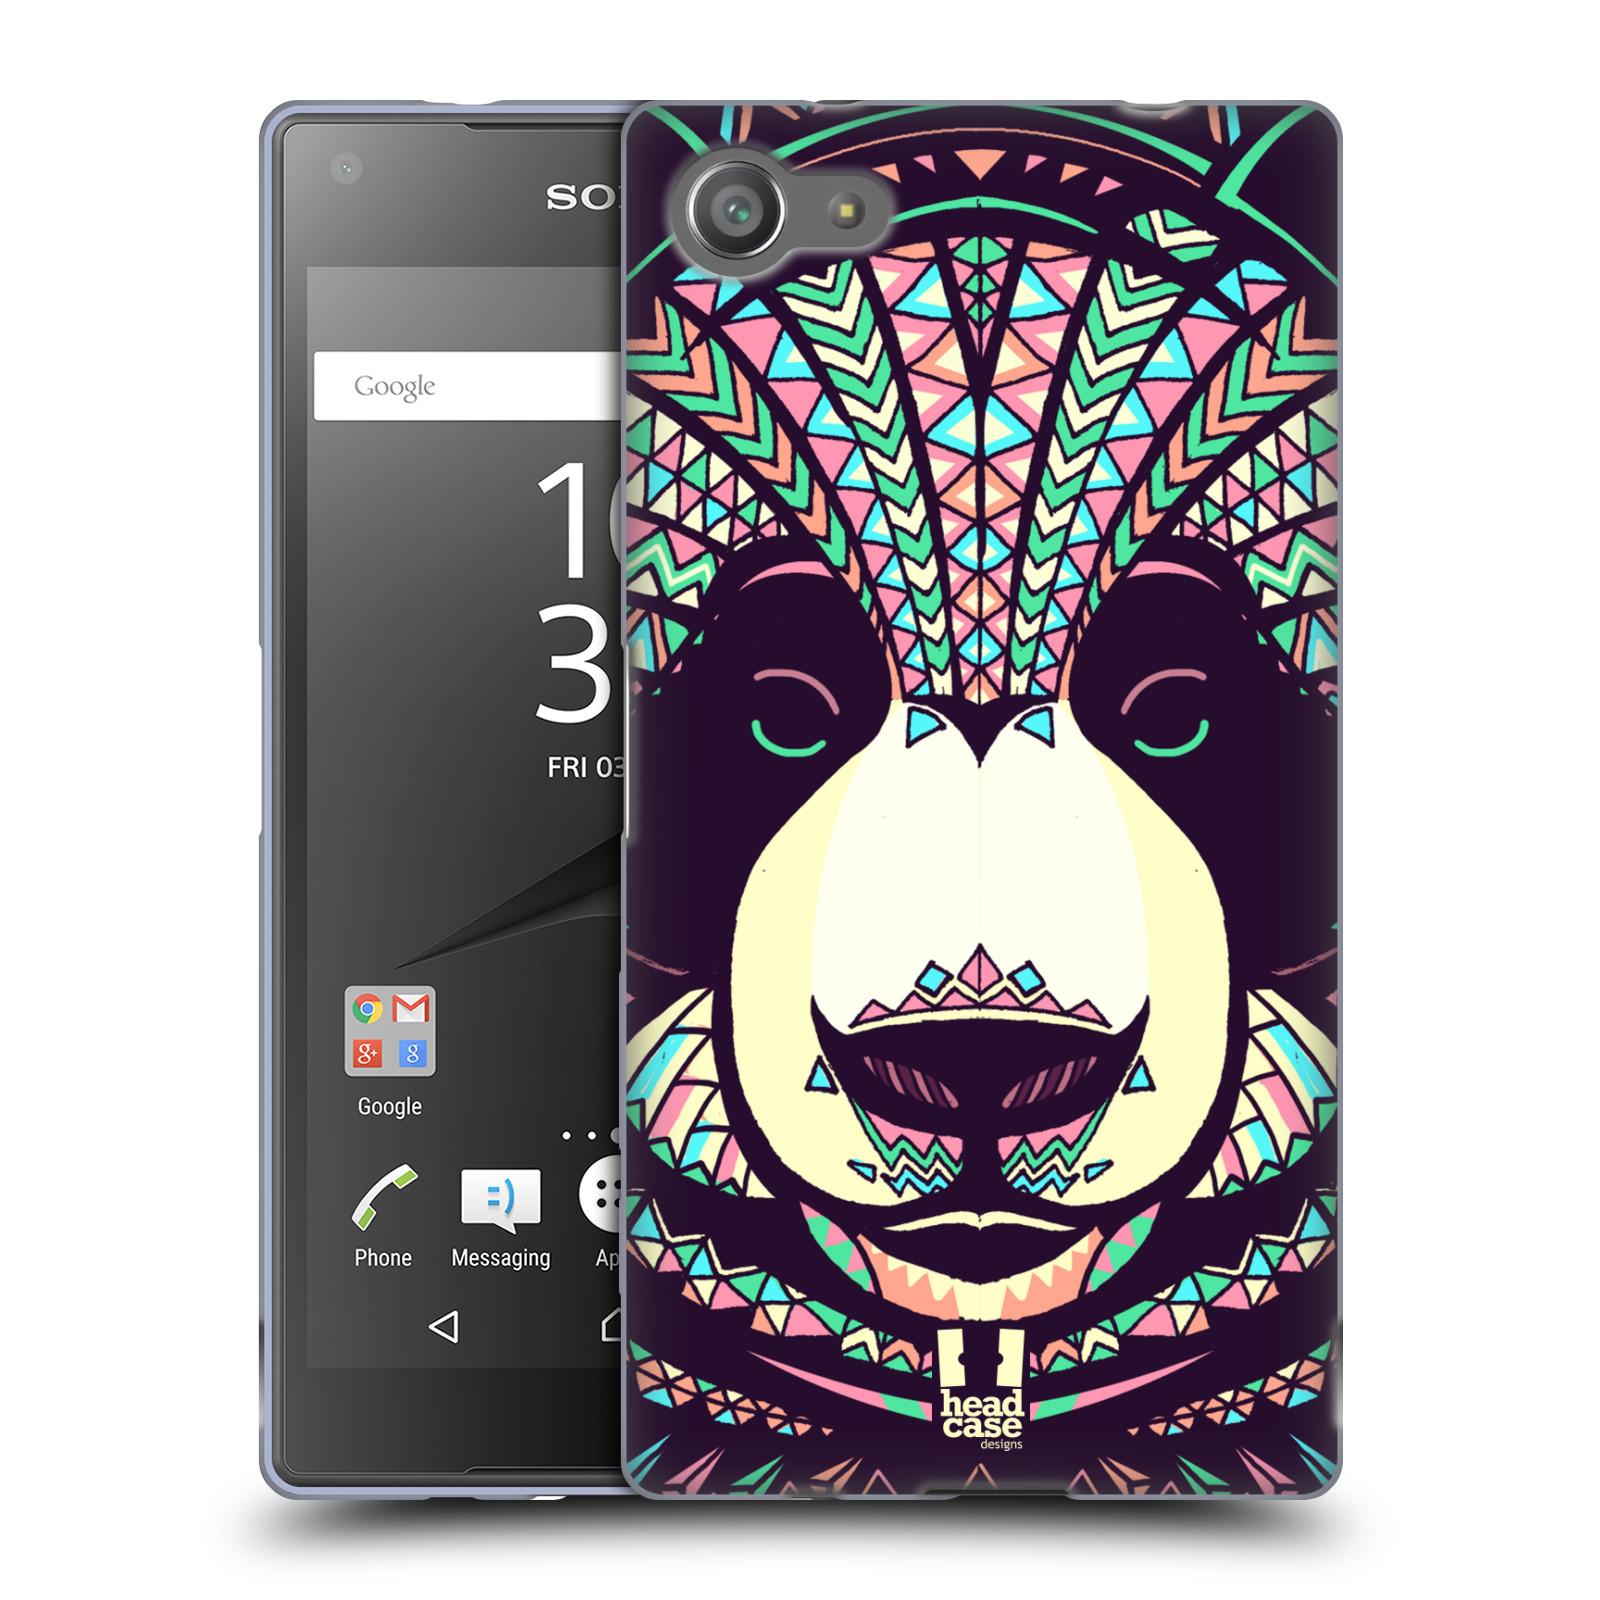 Silikonové pouzdro na mobil Sony Xperia Z5 Compact HEAD CASE AZTEC PANDA